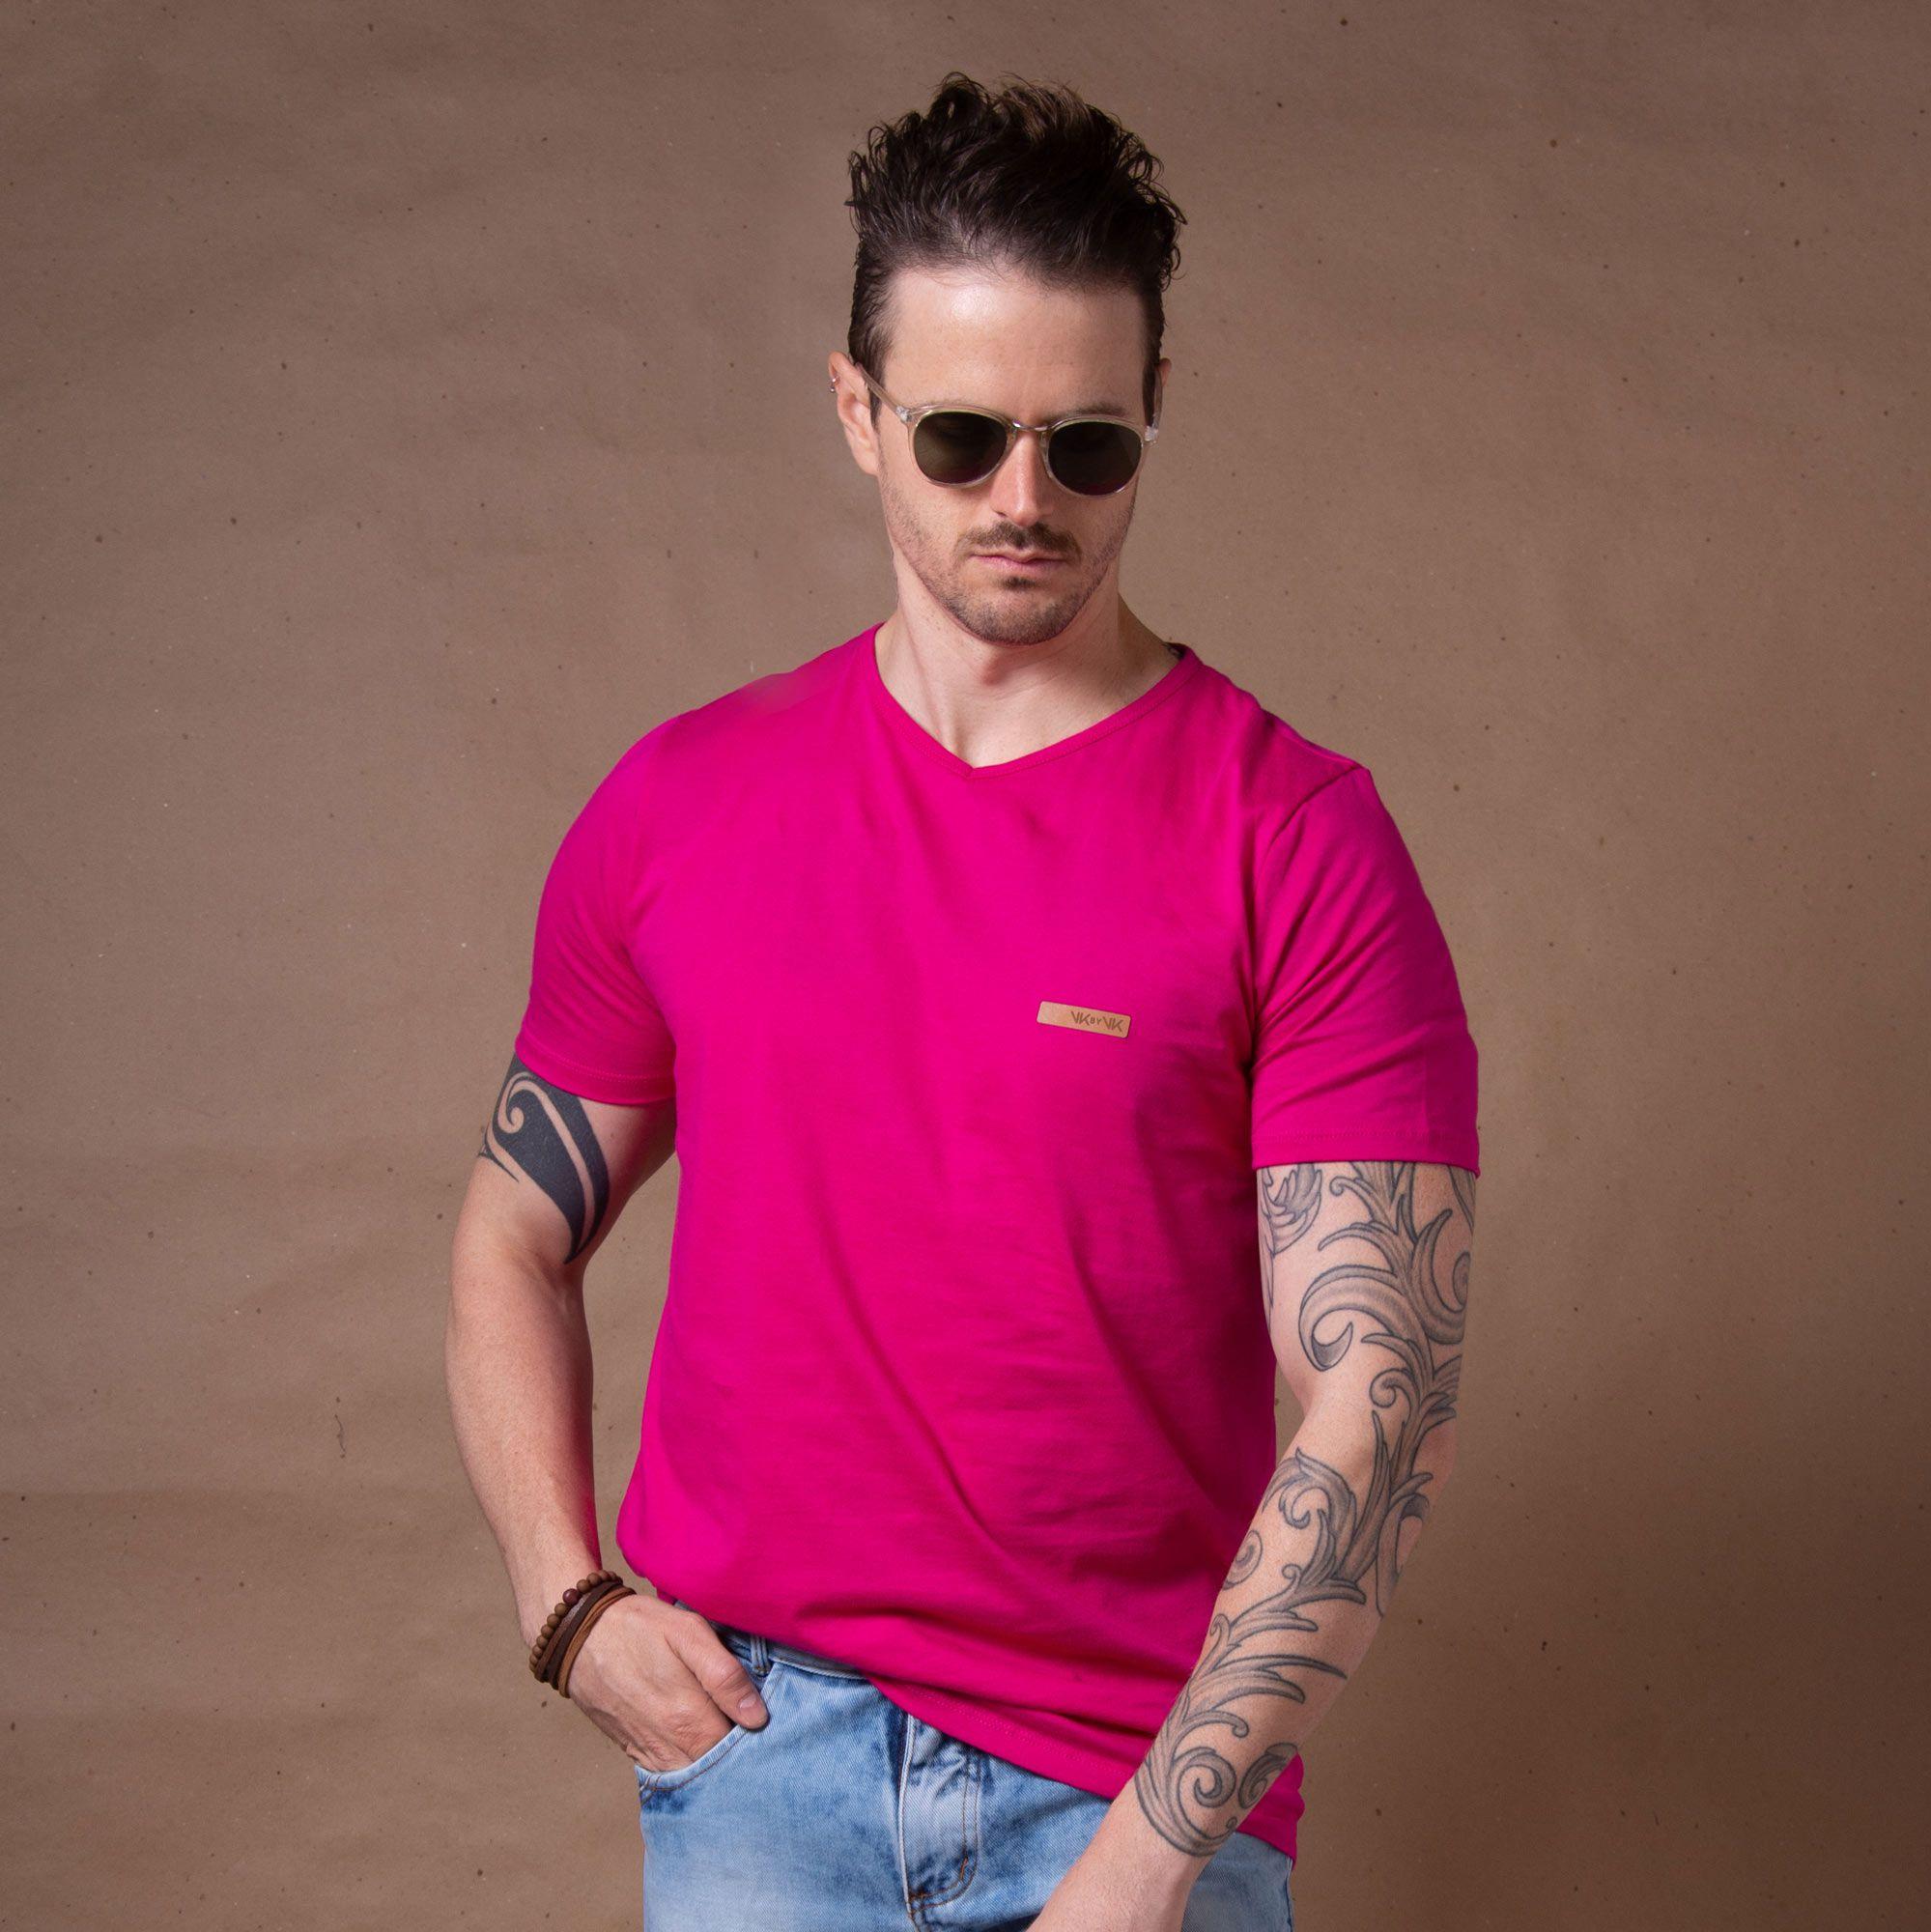 5bfca0dddb Camiseta Básica Gola V Rosa - VK by VK